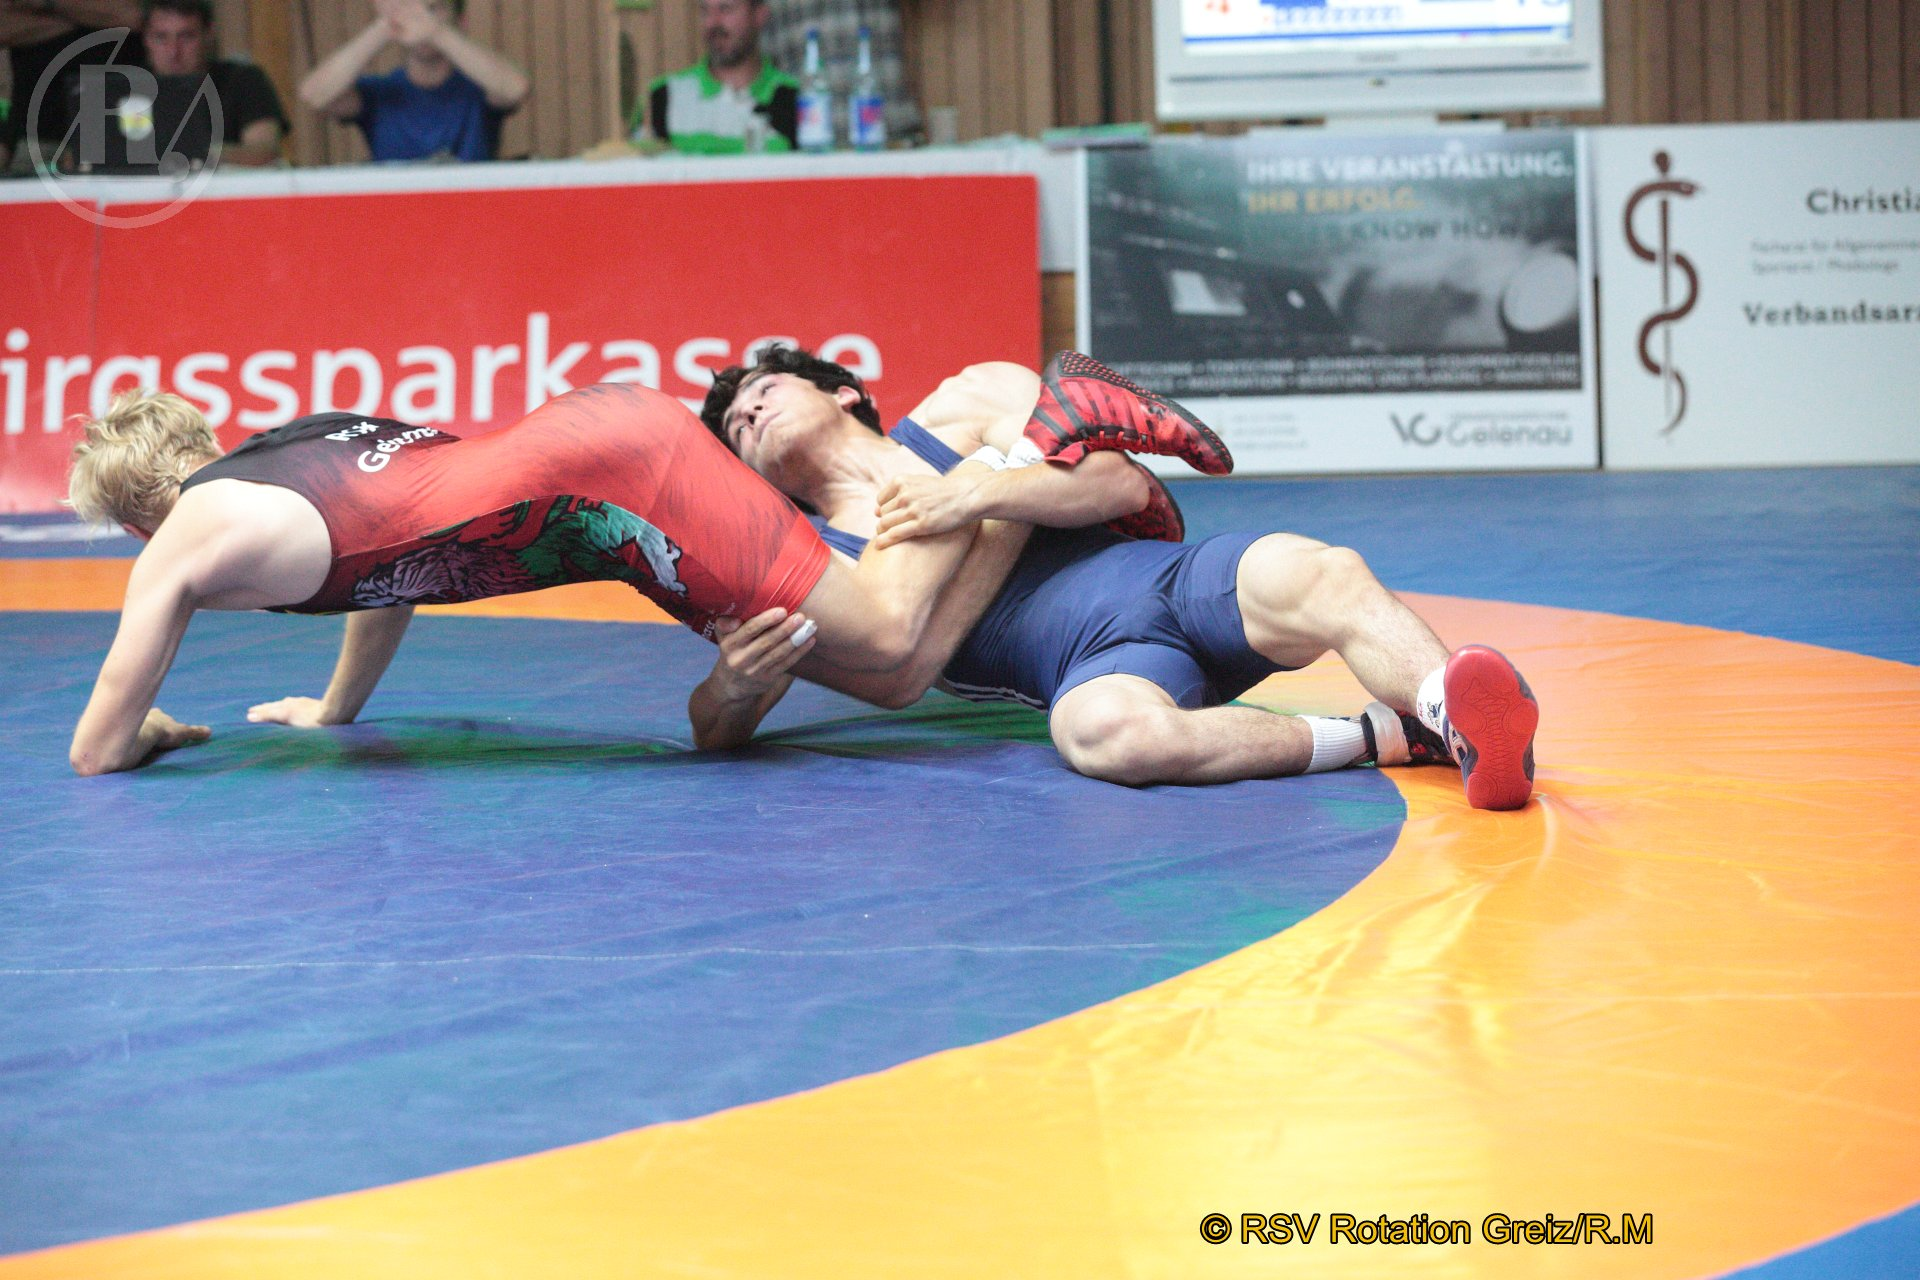 61 kg Freistil: Hofmann, Eric, WKG Gelenau II/Chemnitz gegen Galamatov, Rasul (blaues Trikot), RSV Rotation Greiz II - 0:4/TÜ/4:19/01:05